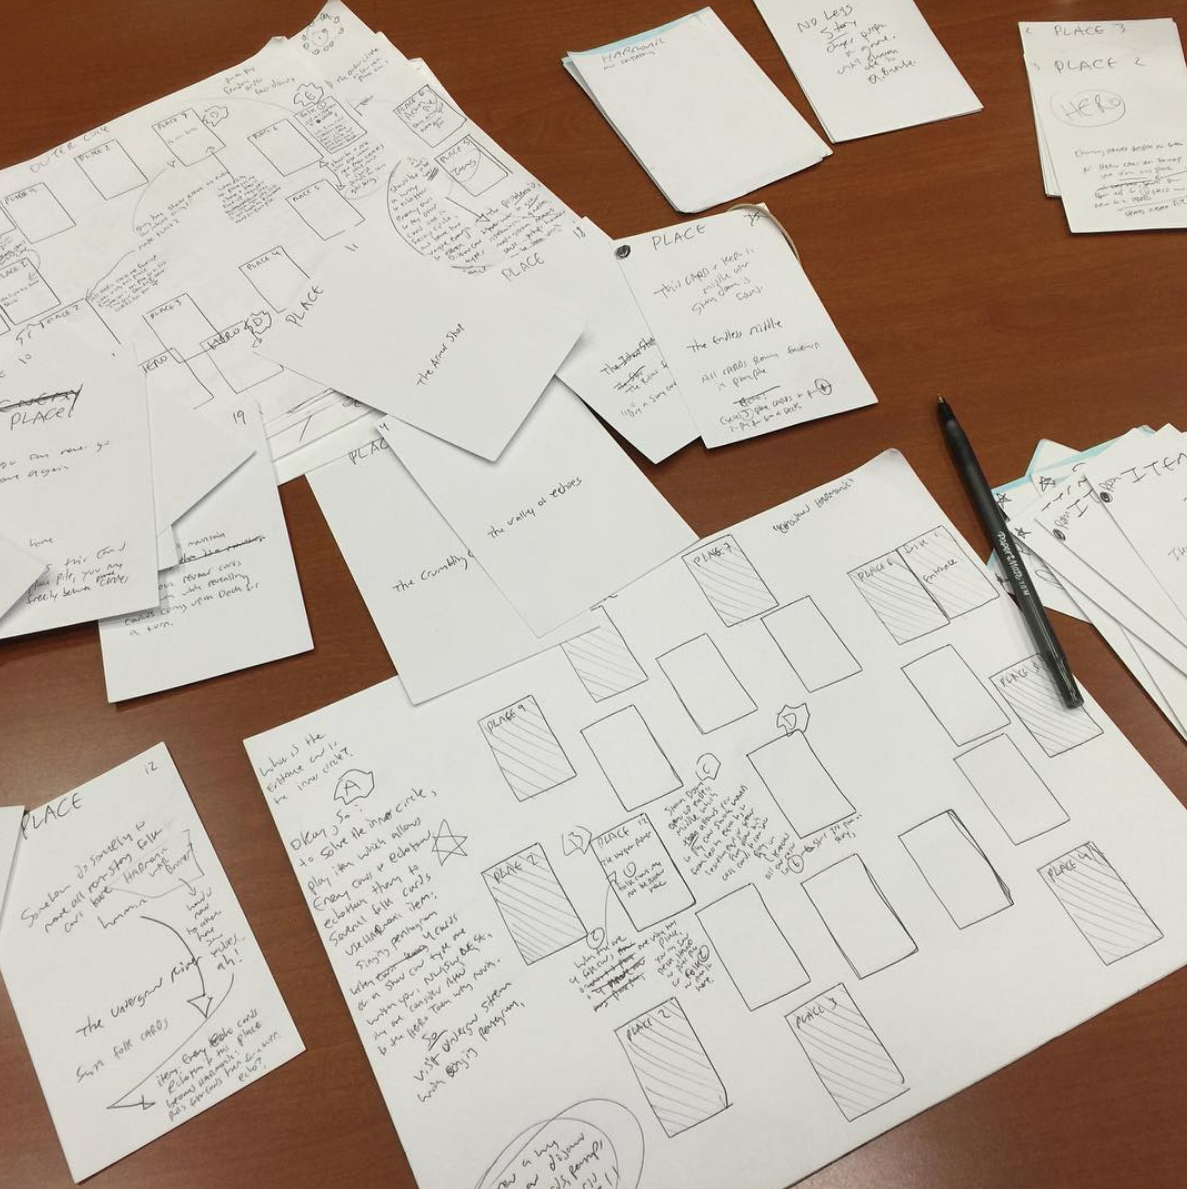 2016 rwTDS game design notes October 27th